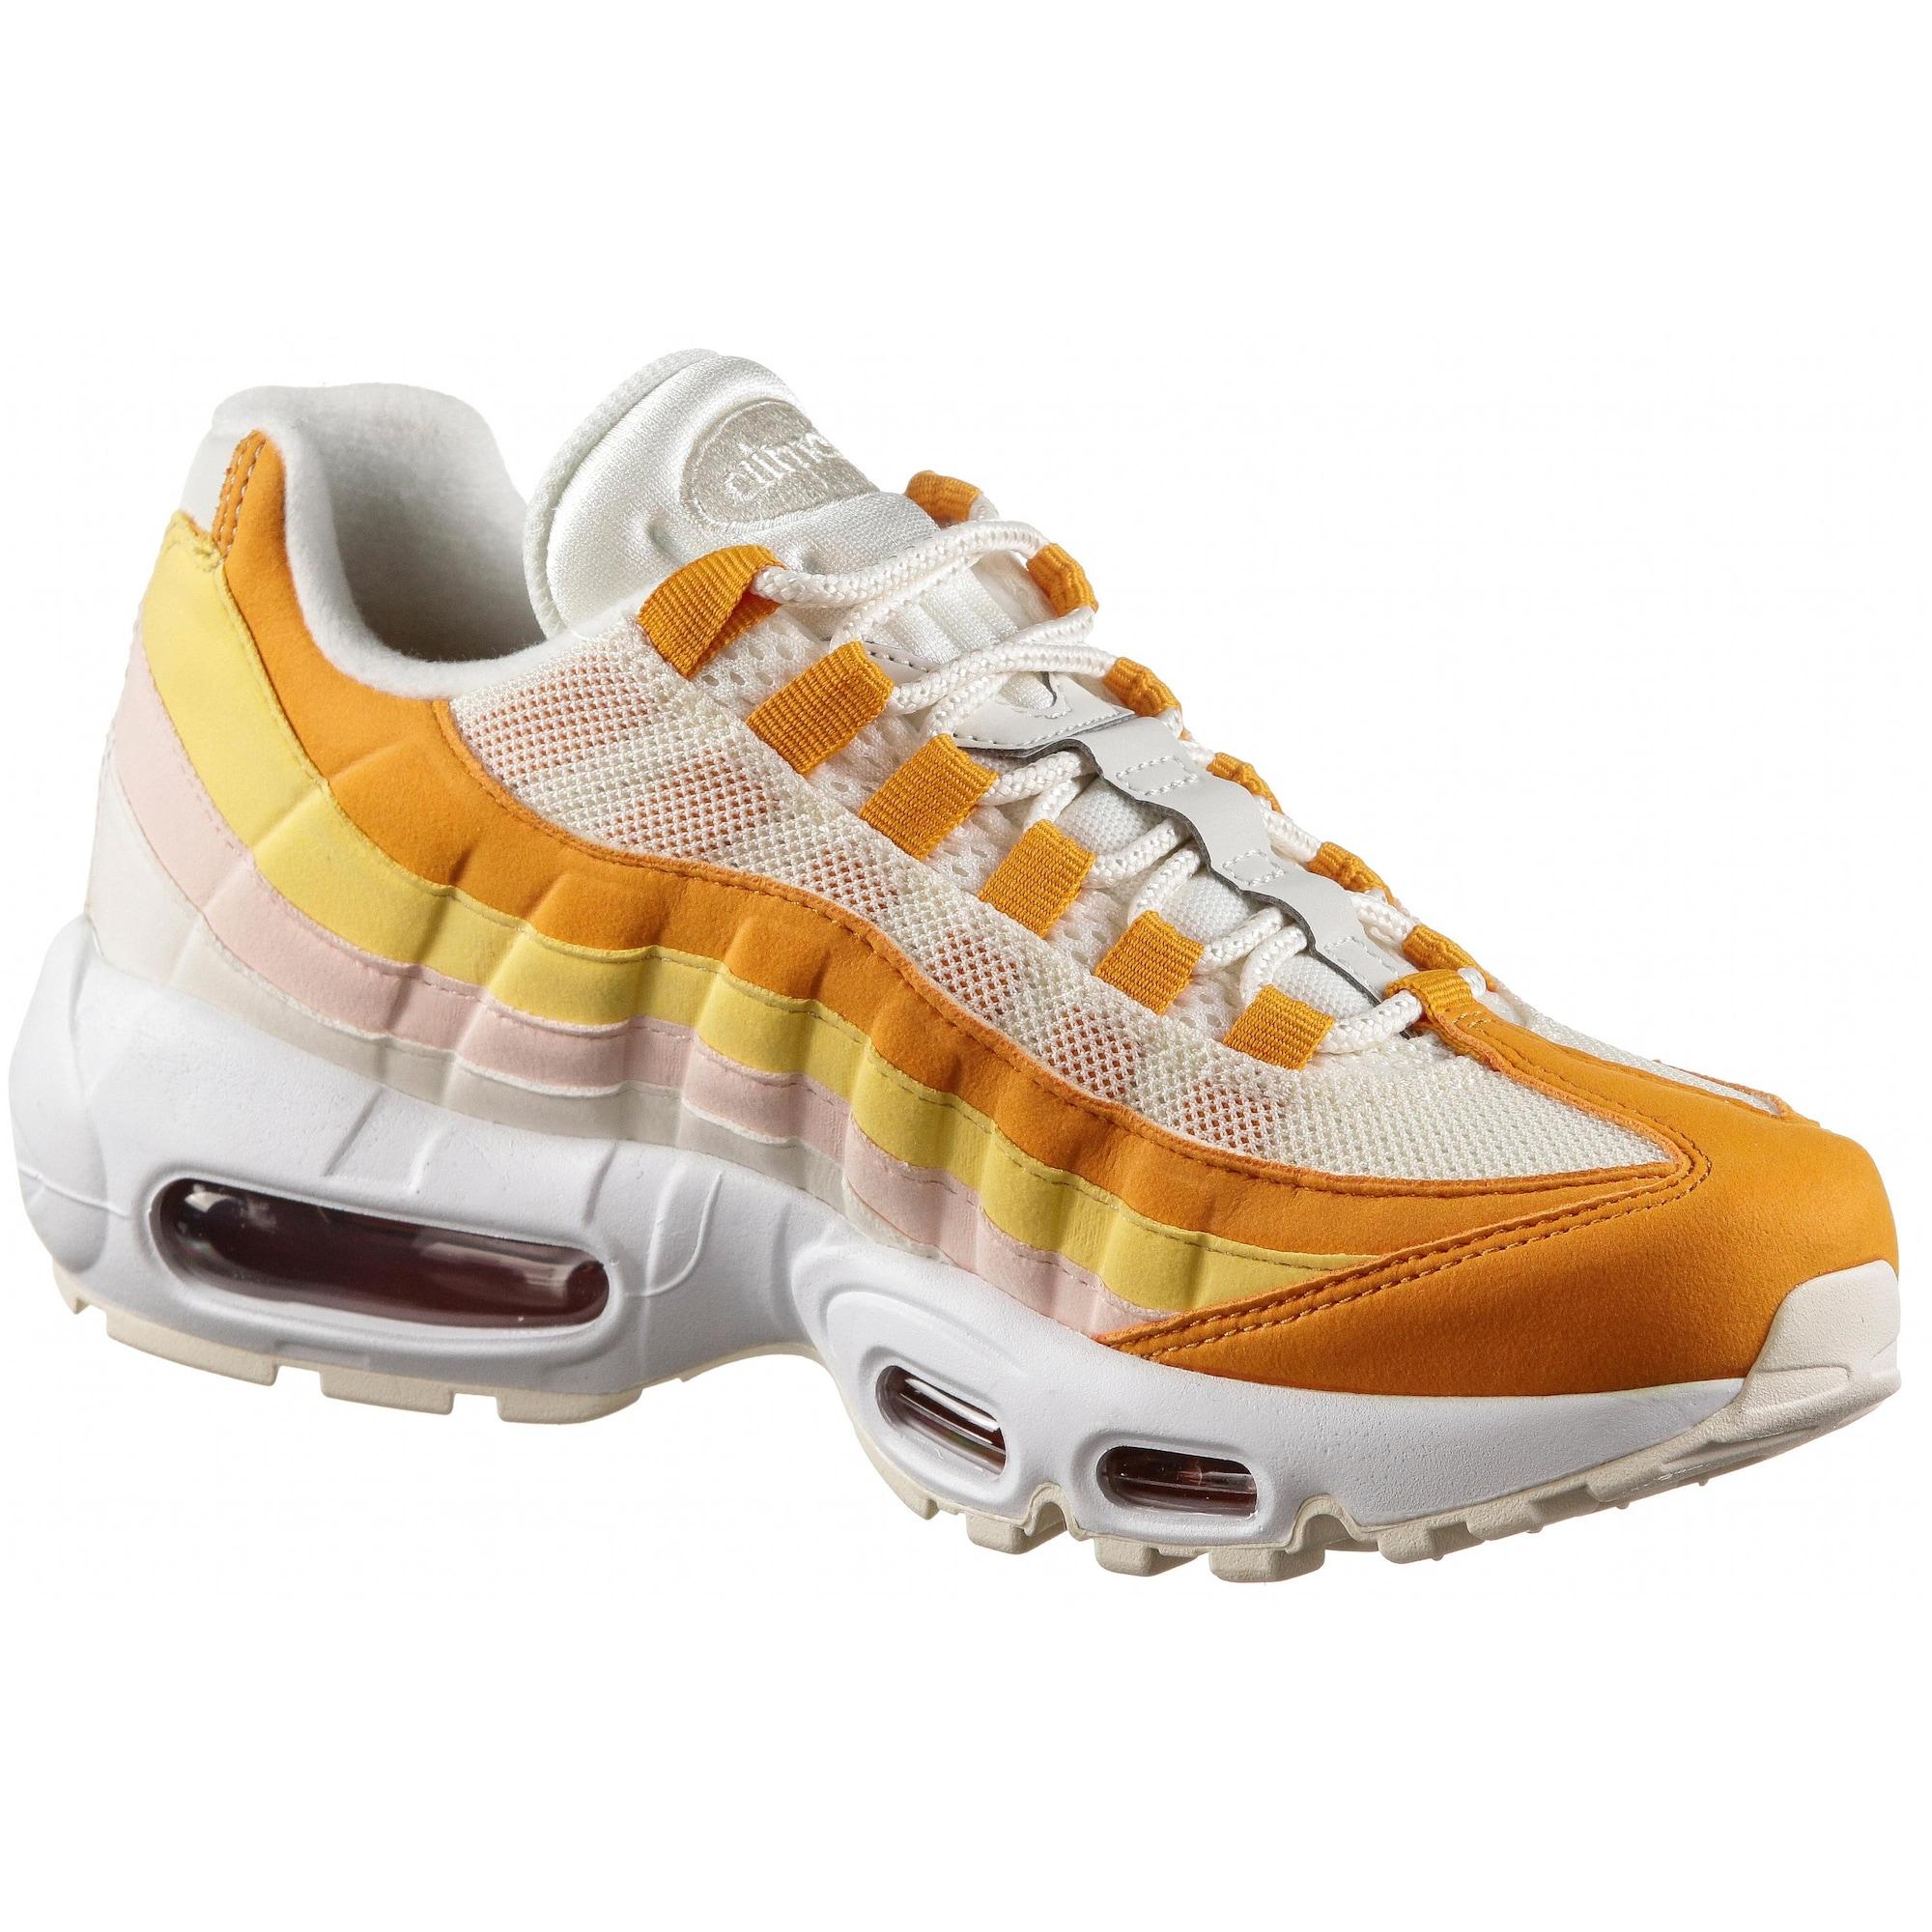 nike sportswear - Sneaker 'Air Max 95'